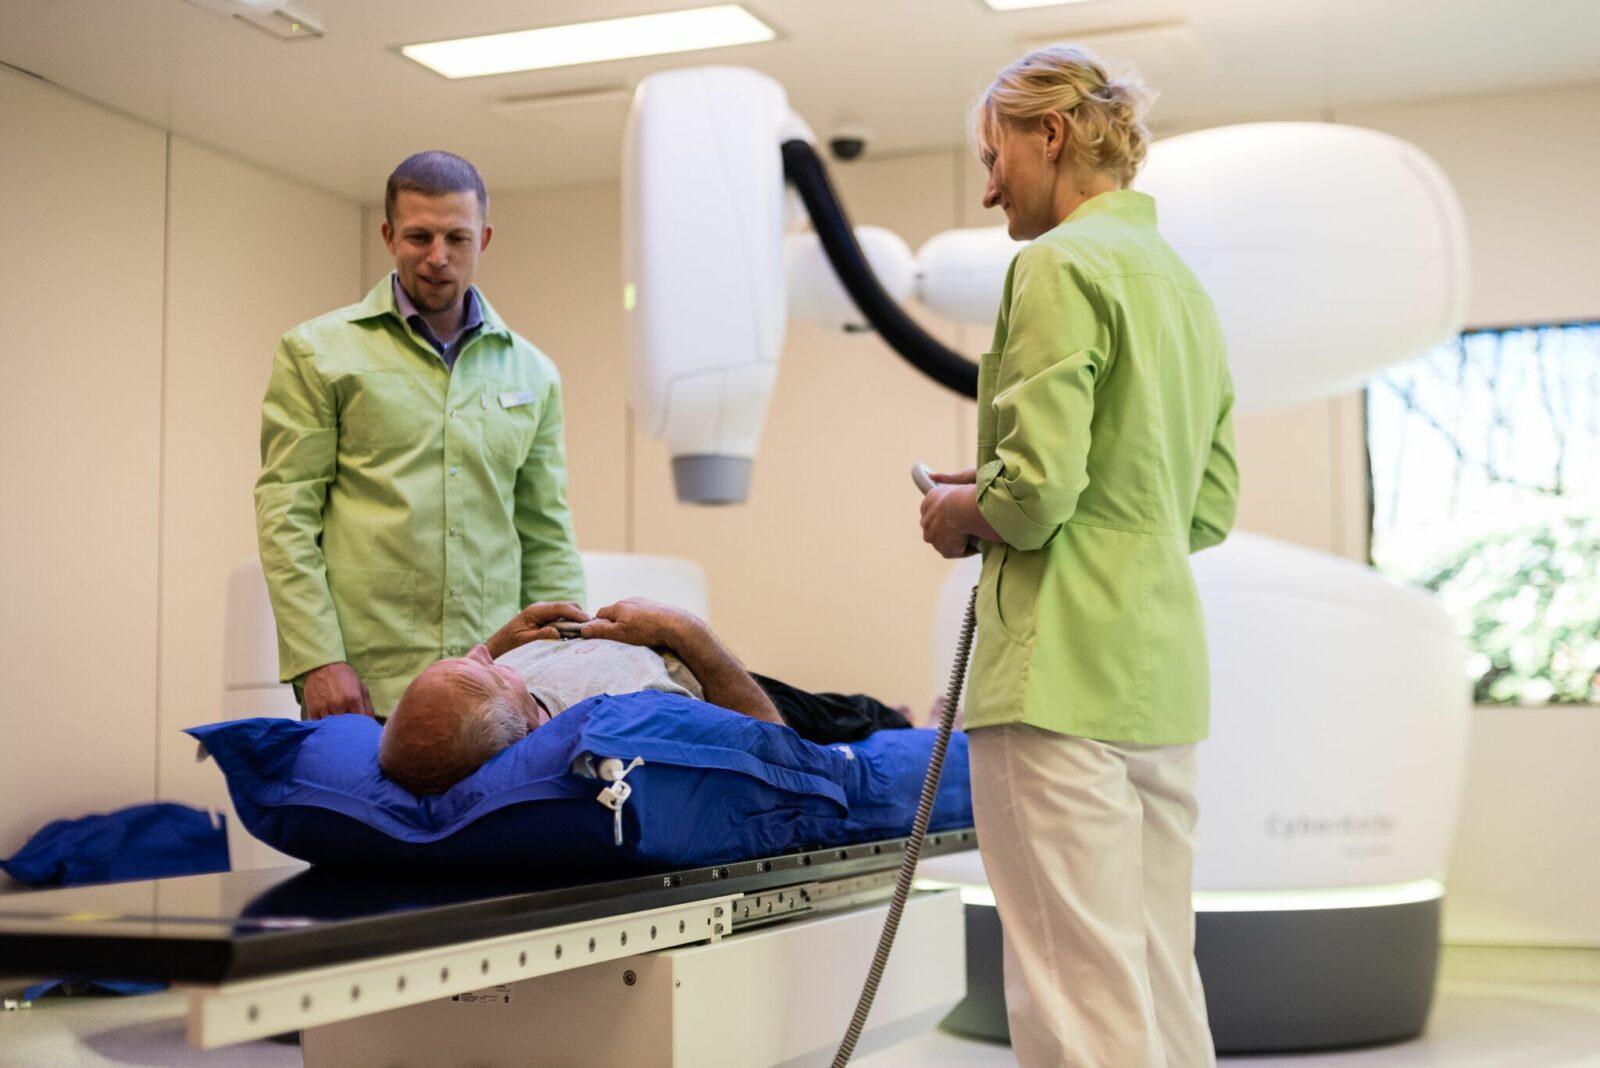 Treatment Of Metastatic Cancer With Radiosurgery Cyberknife